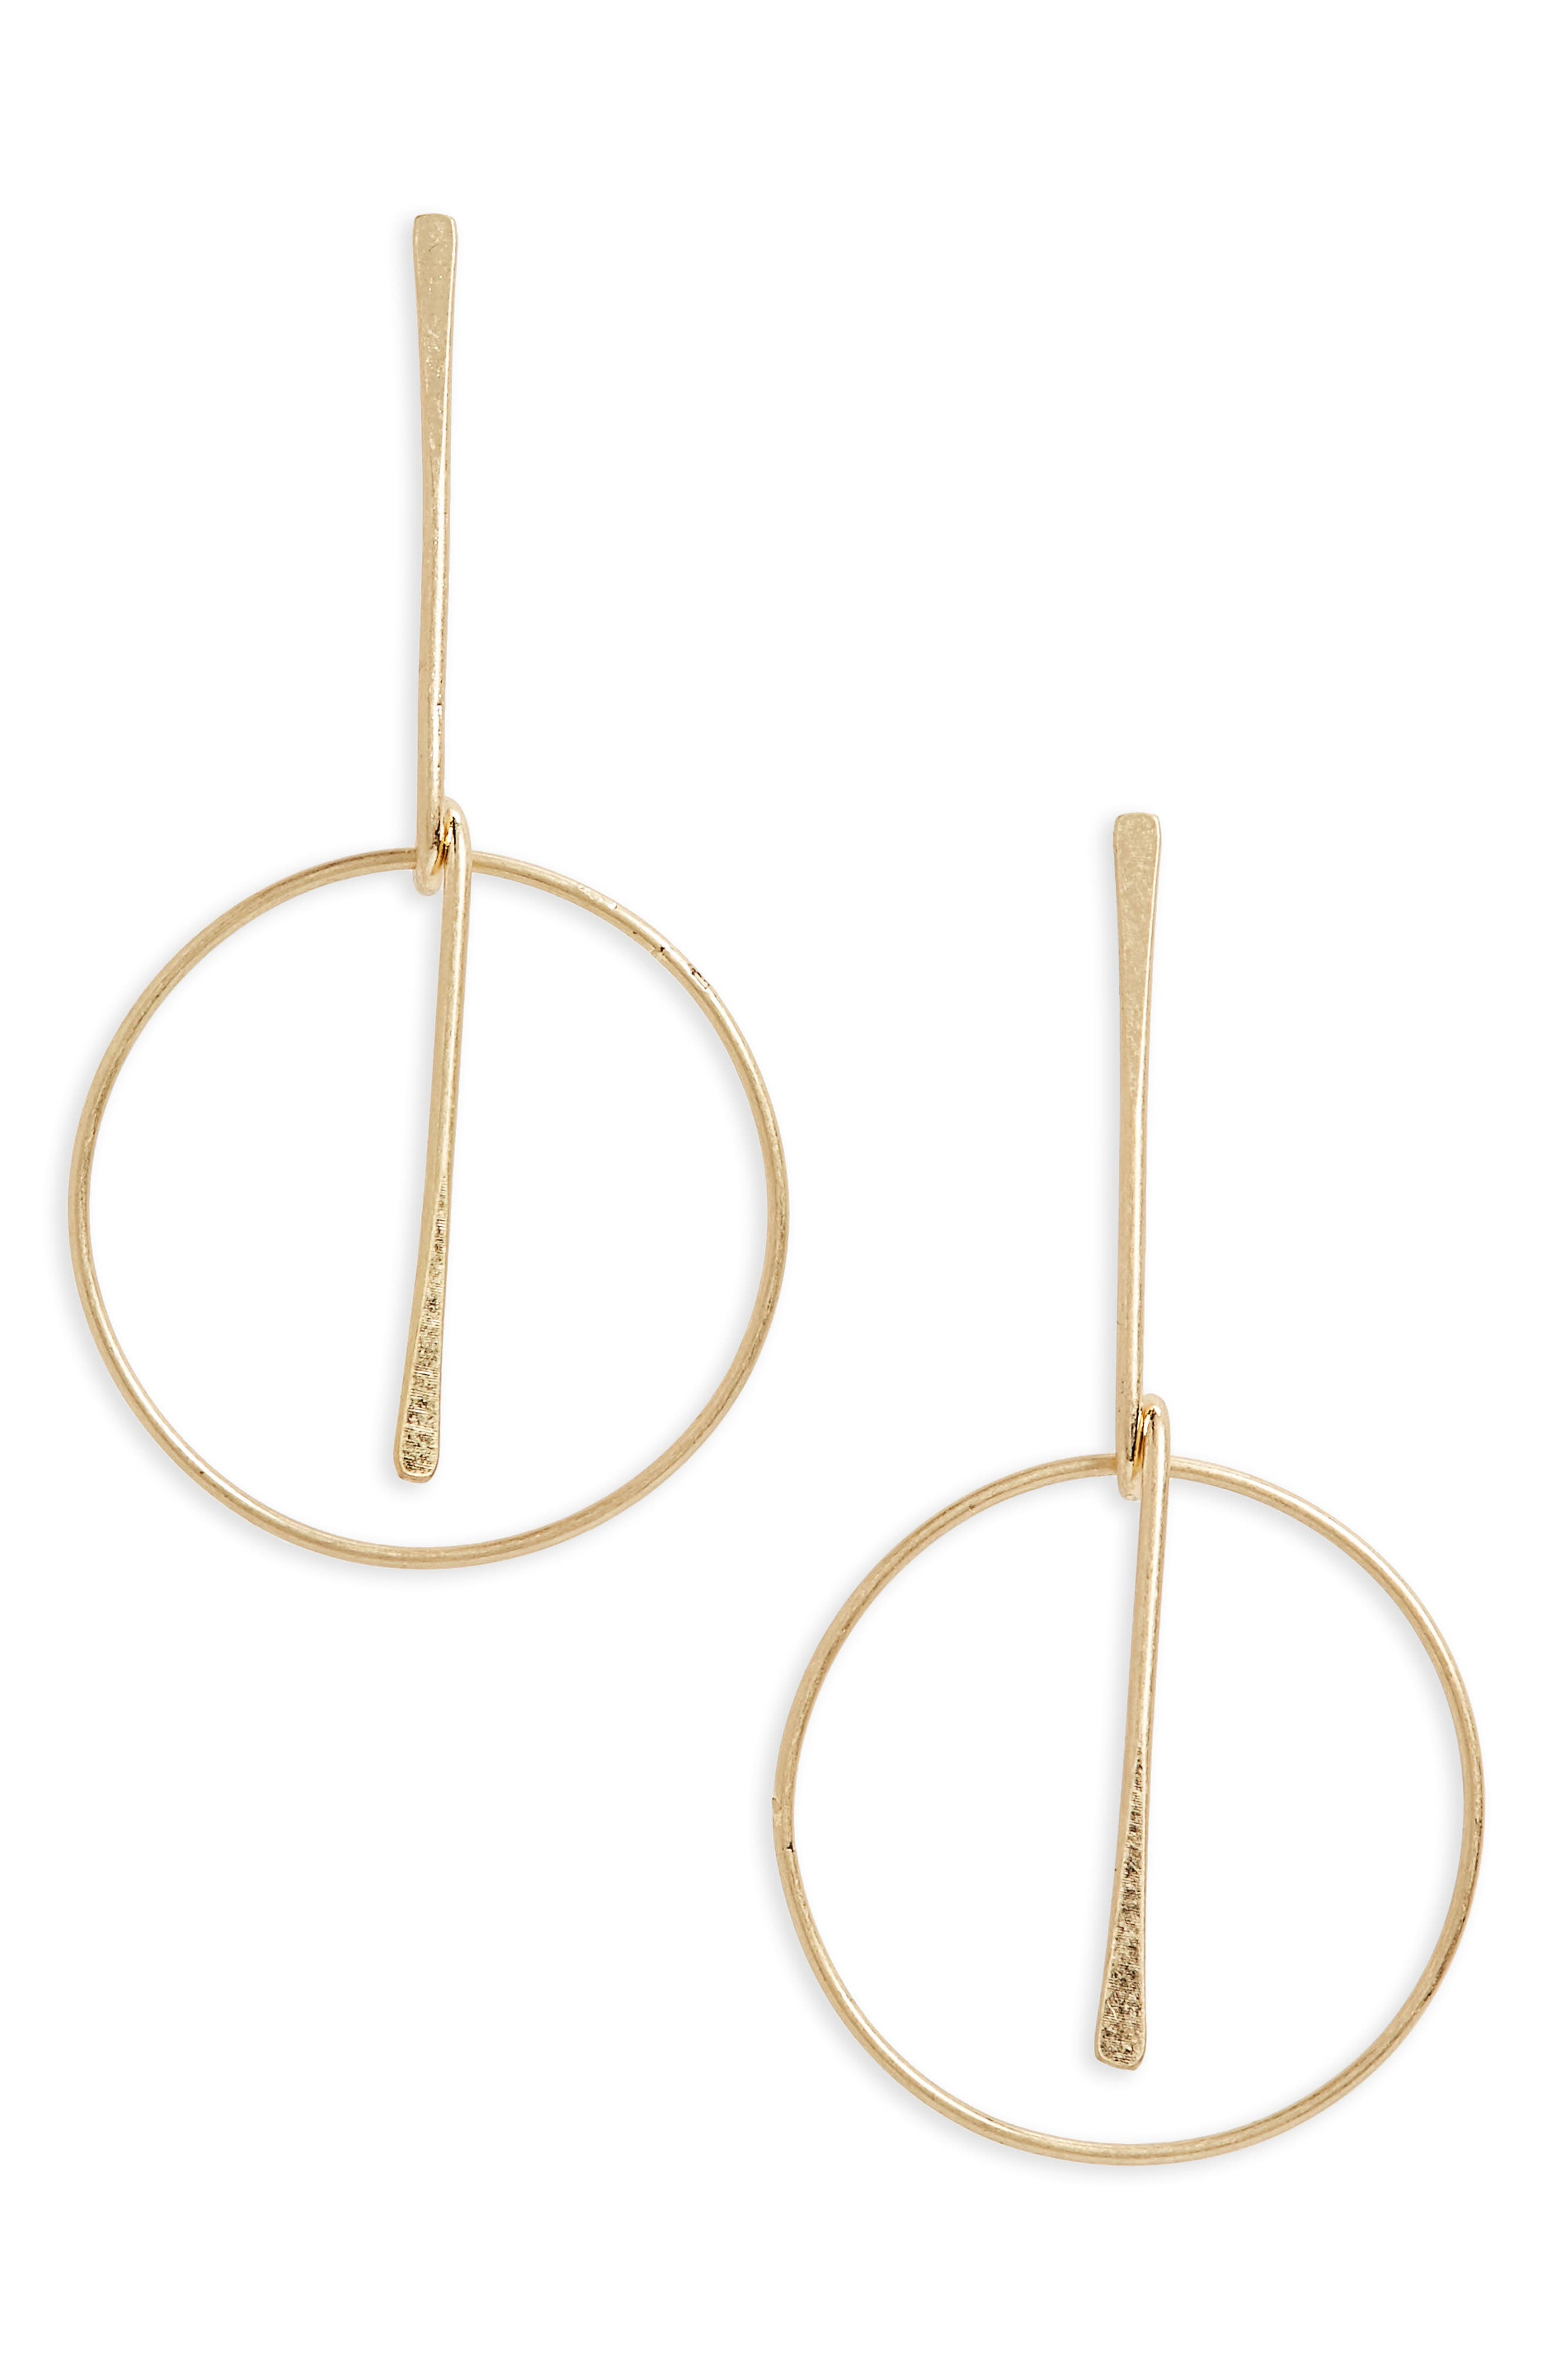 Frontal Hoop Earrings,                             Main thumbnail 1, color,                             710